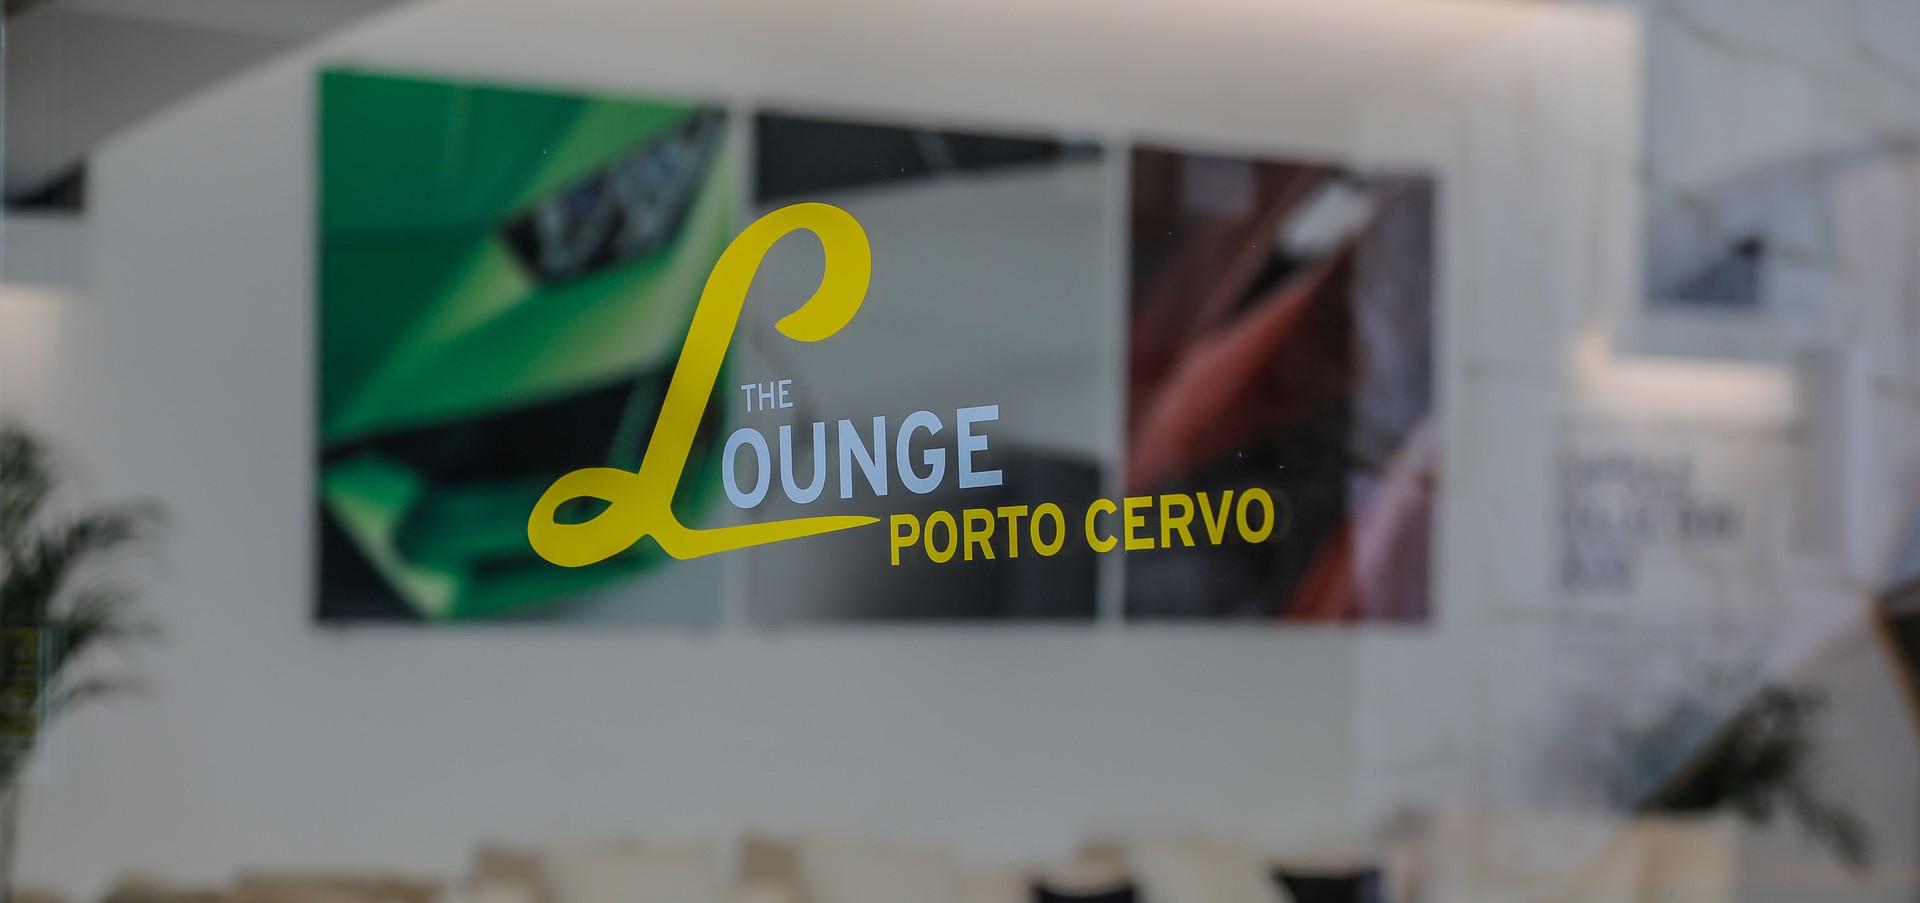 Lamborghini Lounge returns to Porto Cervo